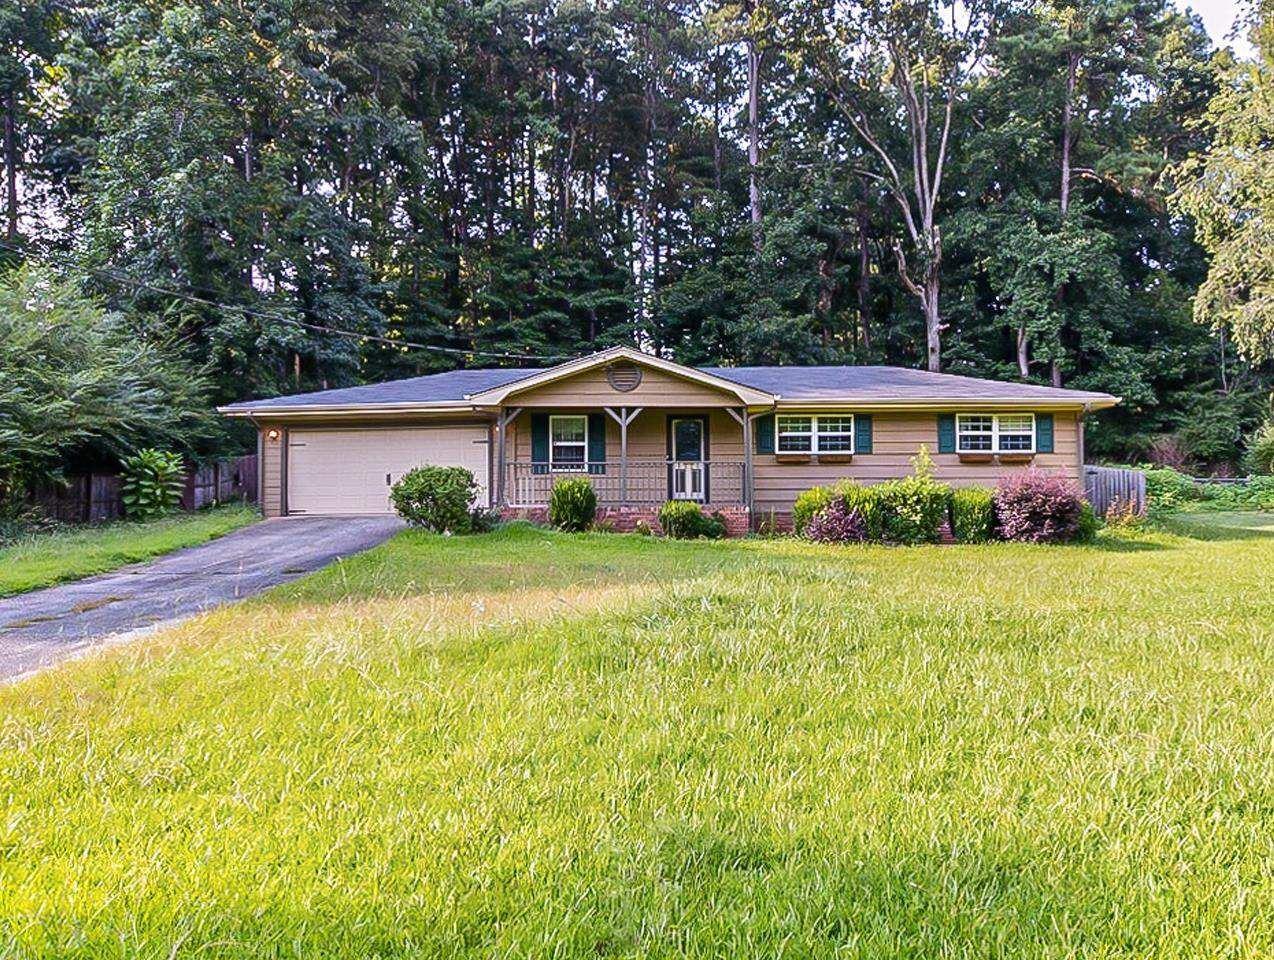 6186 Prince, Douglasville, GA 30135 - MLS#: 9027805